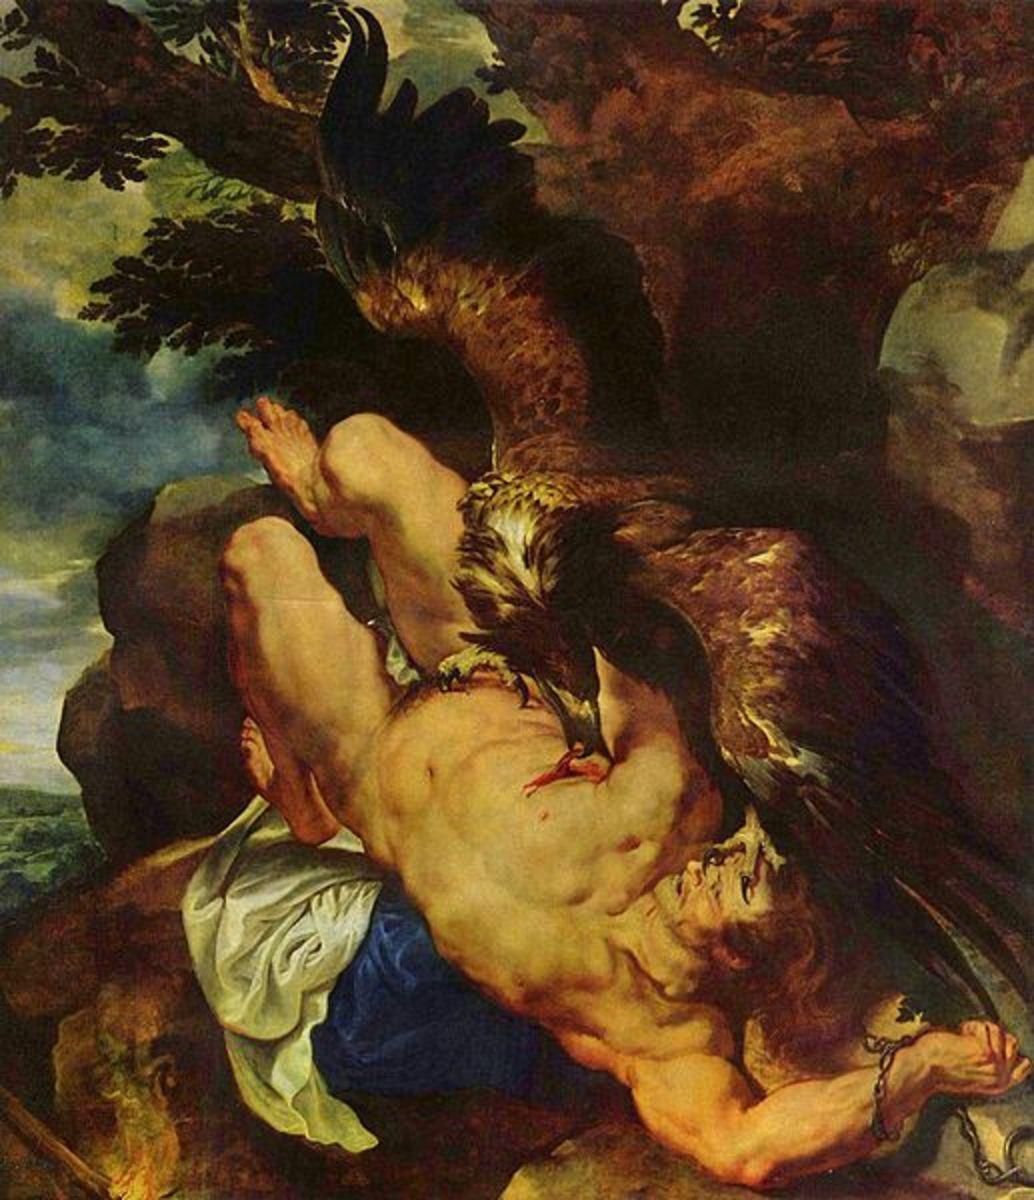 Prometheus and the Caucasian Eagle - Peter Paul Rubens (1577–1640) - PD-art-100